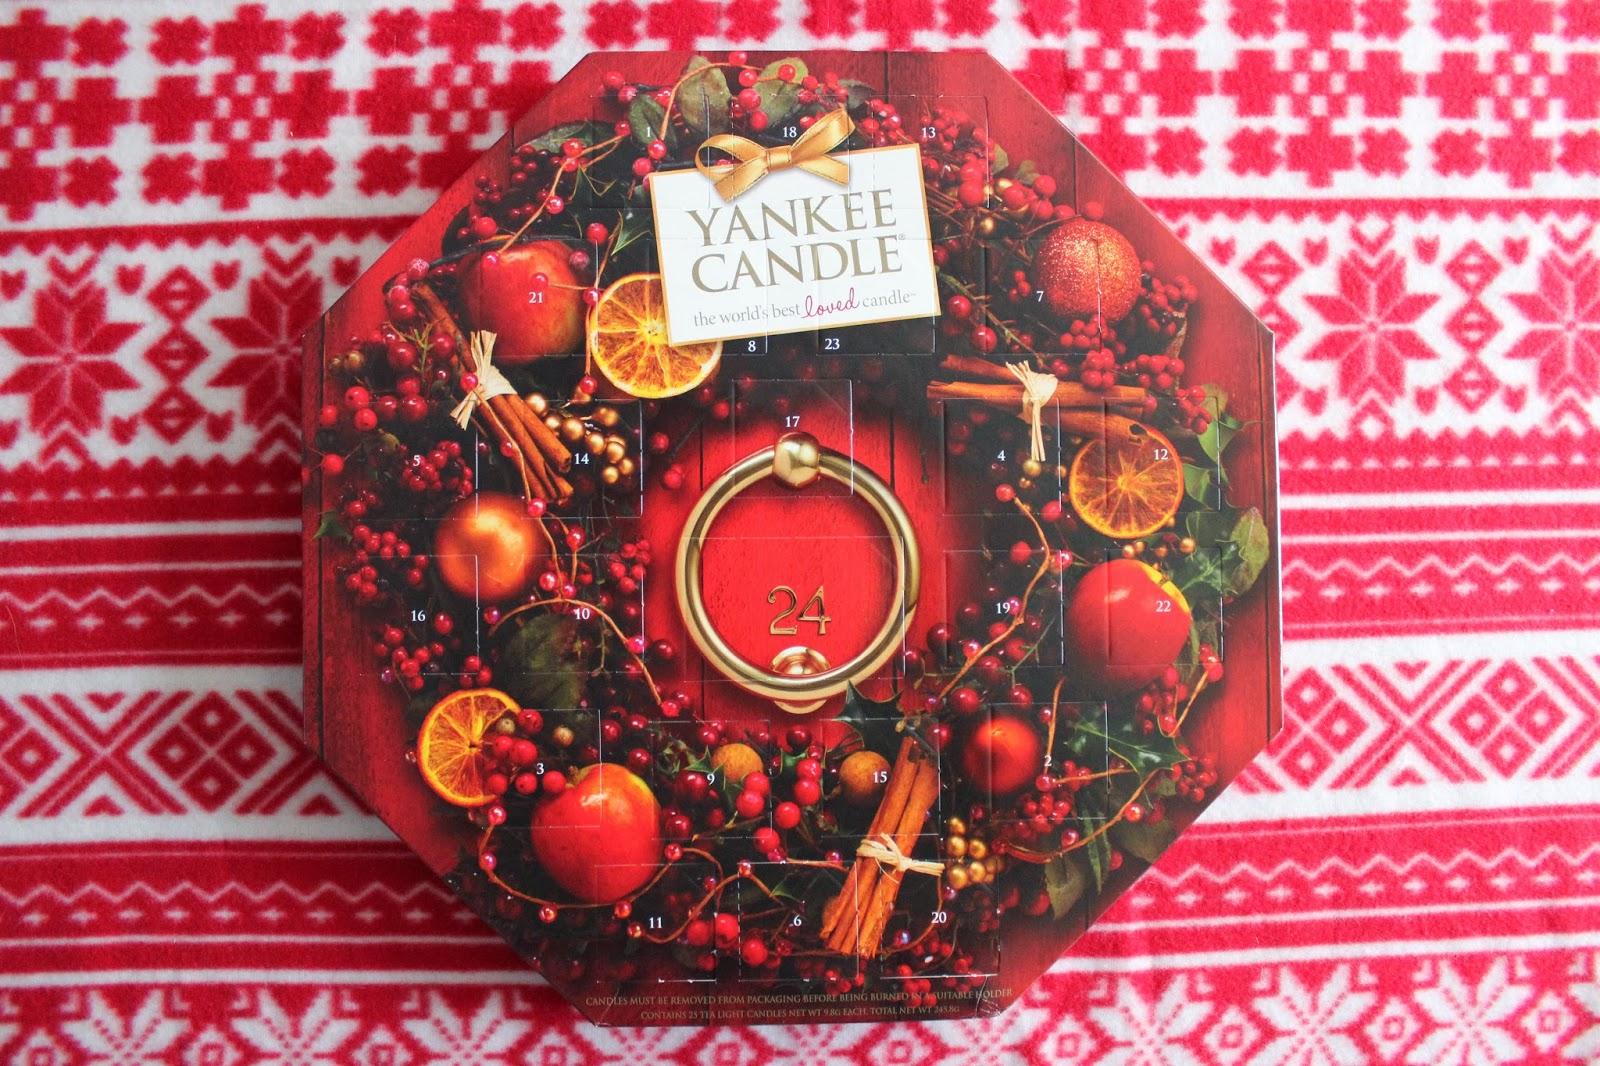 yankee candle adventni kalendar YANKEE CANDLE ADVENT CALENDAR yankee candle adventni kalendar